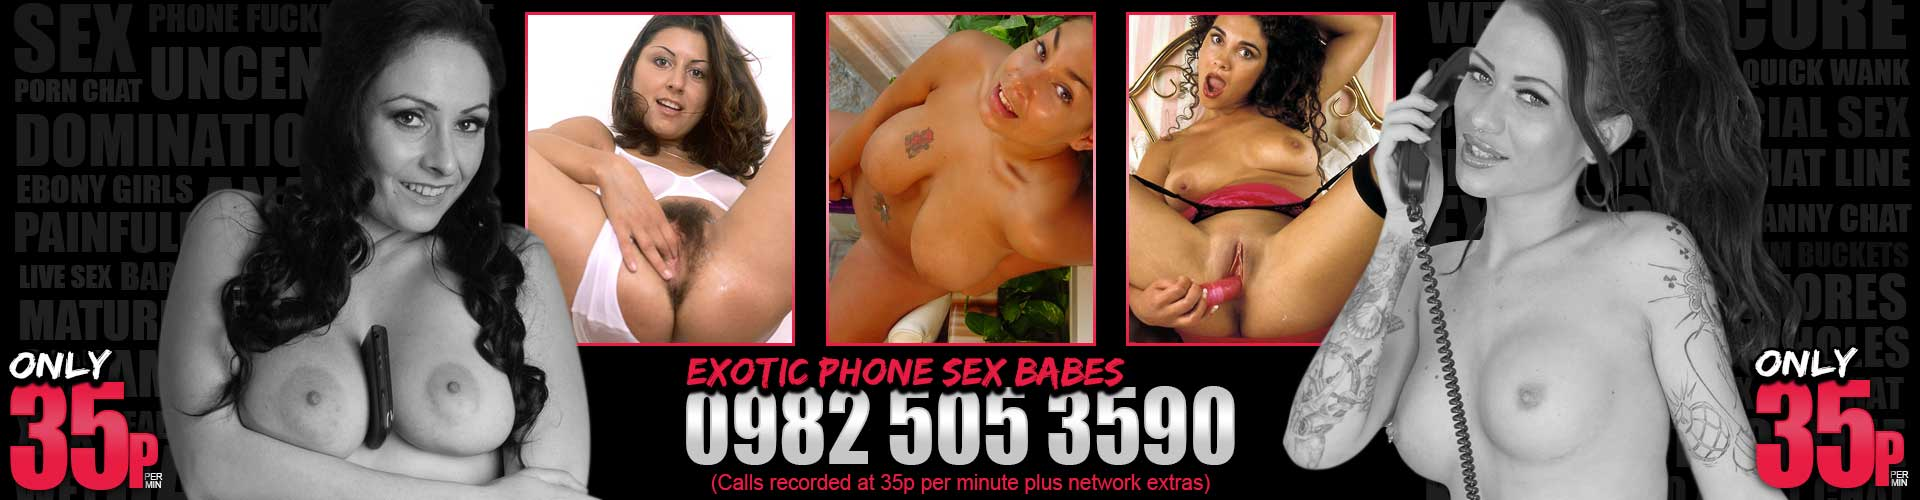 Exotic Phone Sex Girls